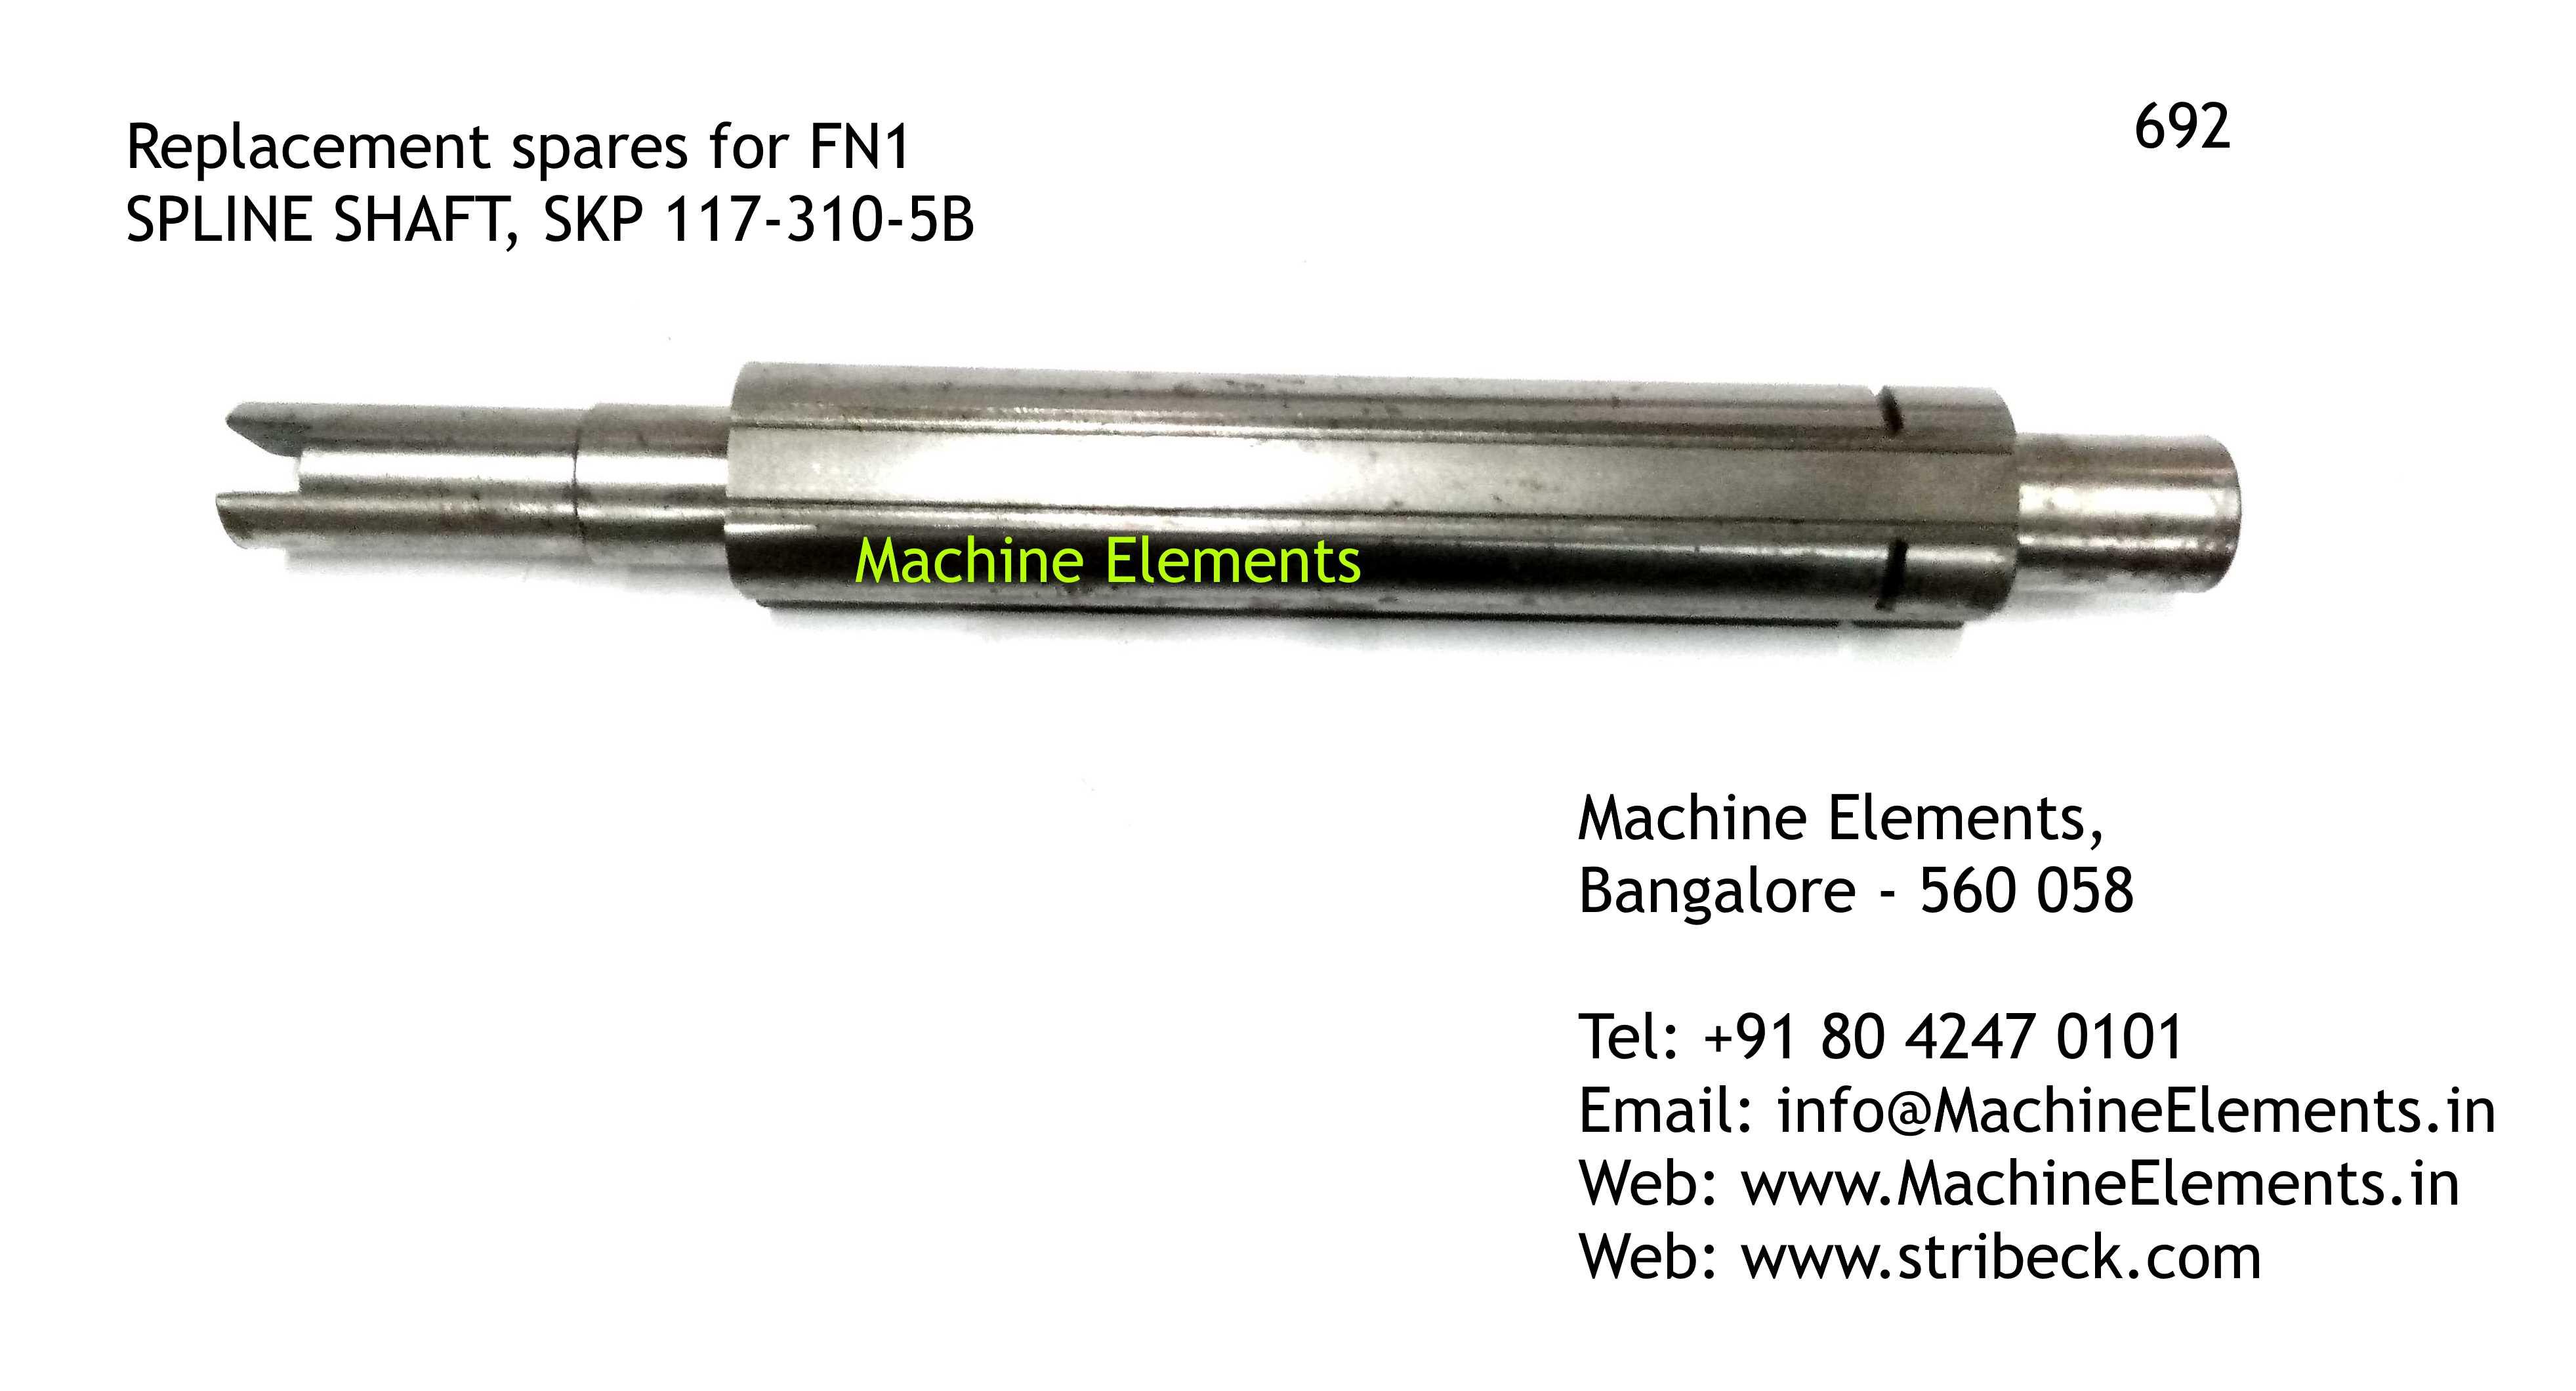 SPLINE SHAFT, SKP 117-310-5B